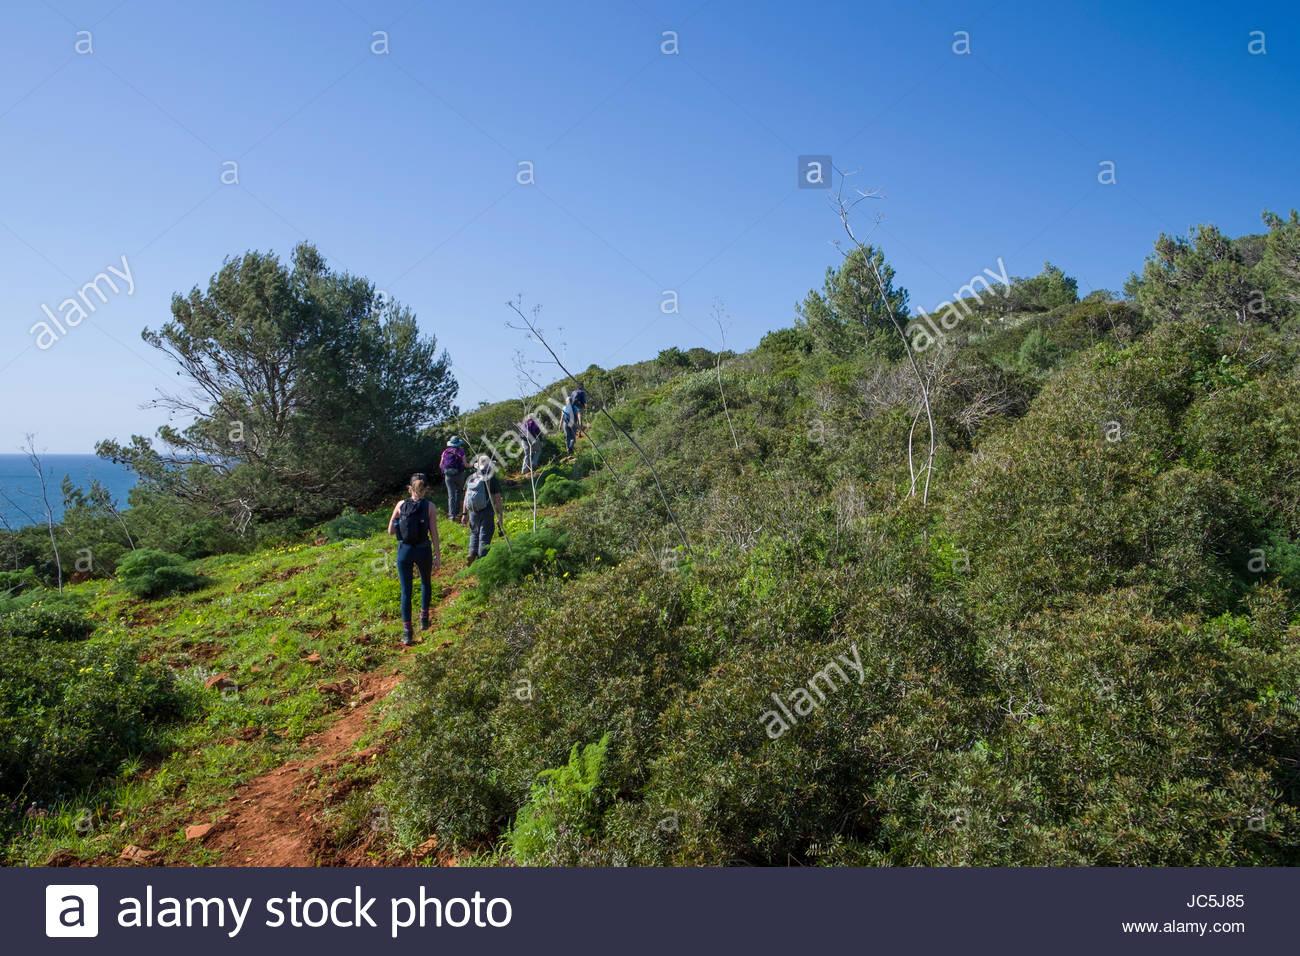 Members of the REI Adventures Portugal coastal hiking tour walking through the lush green Algarve coastline, Southwest - Stock Image